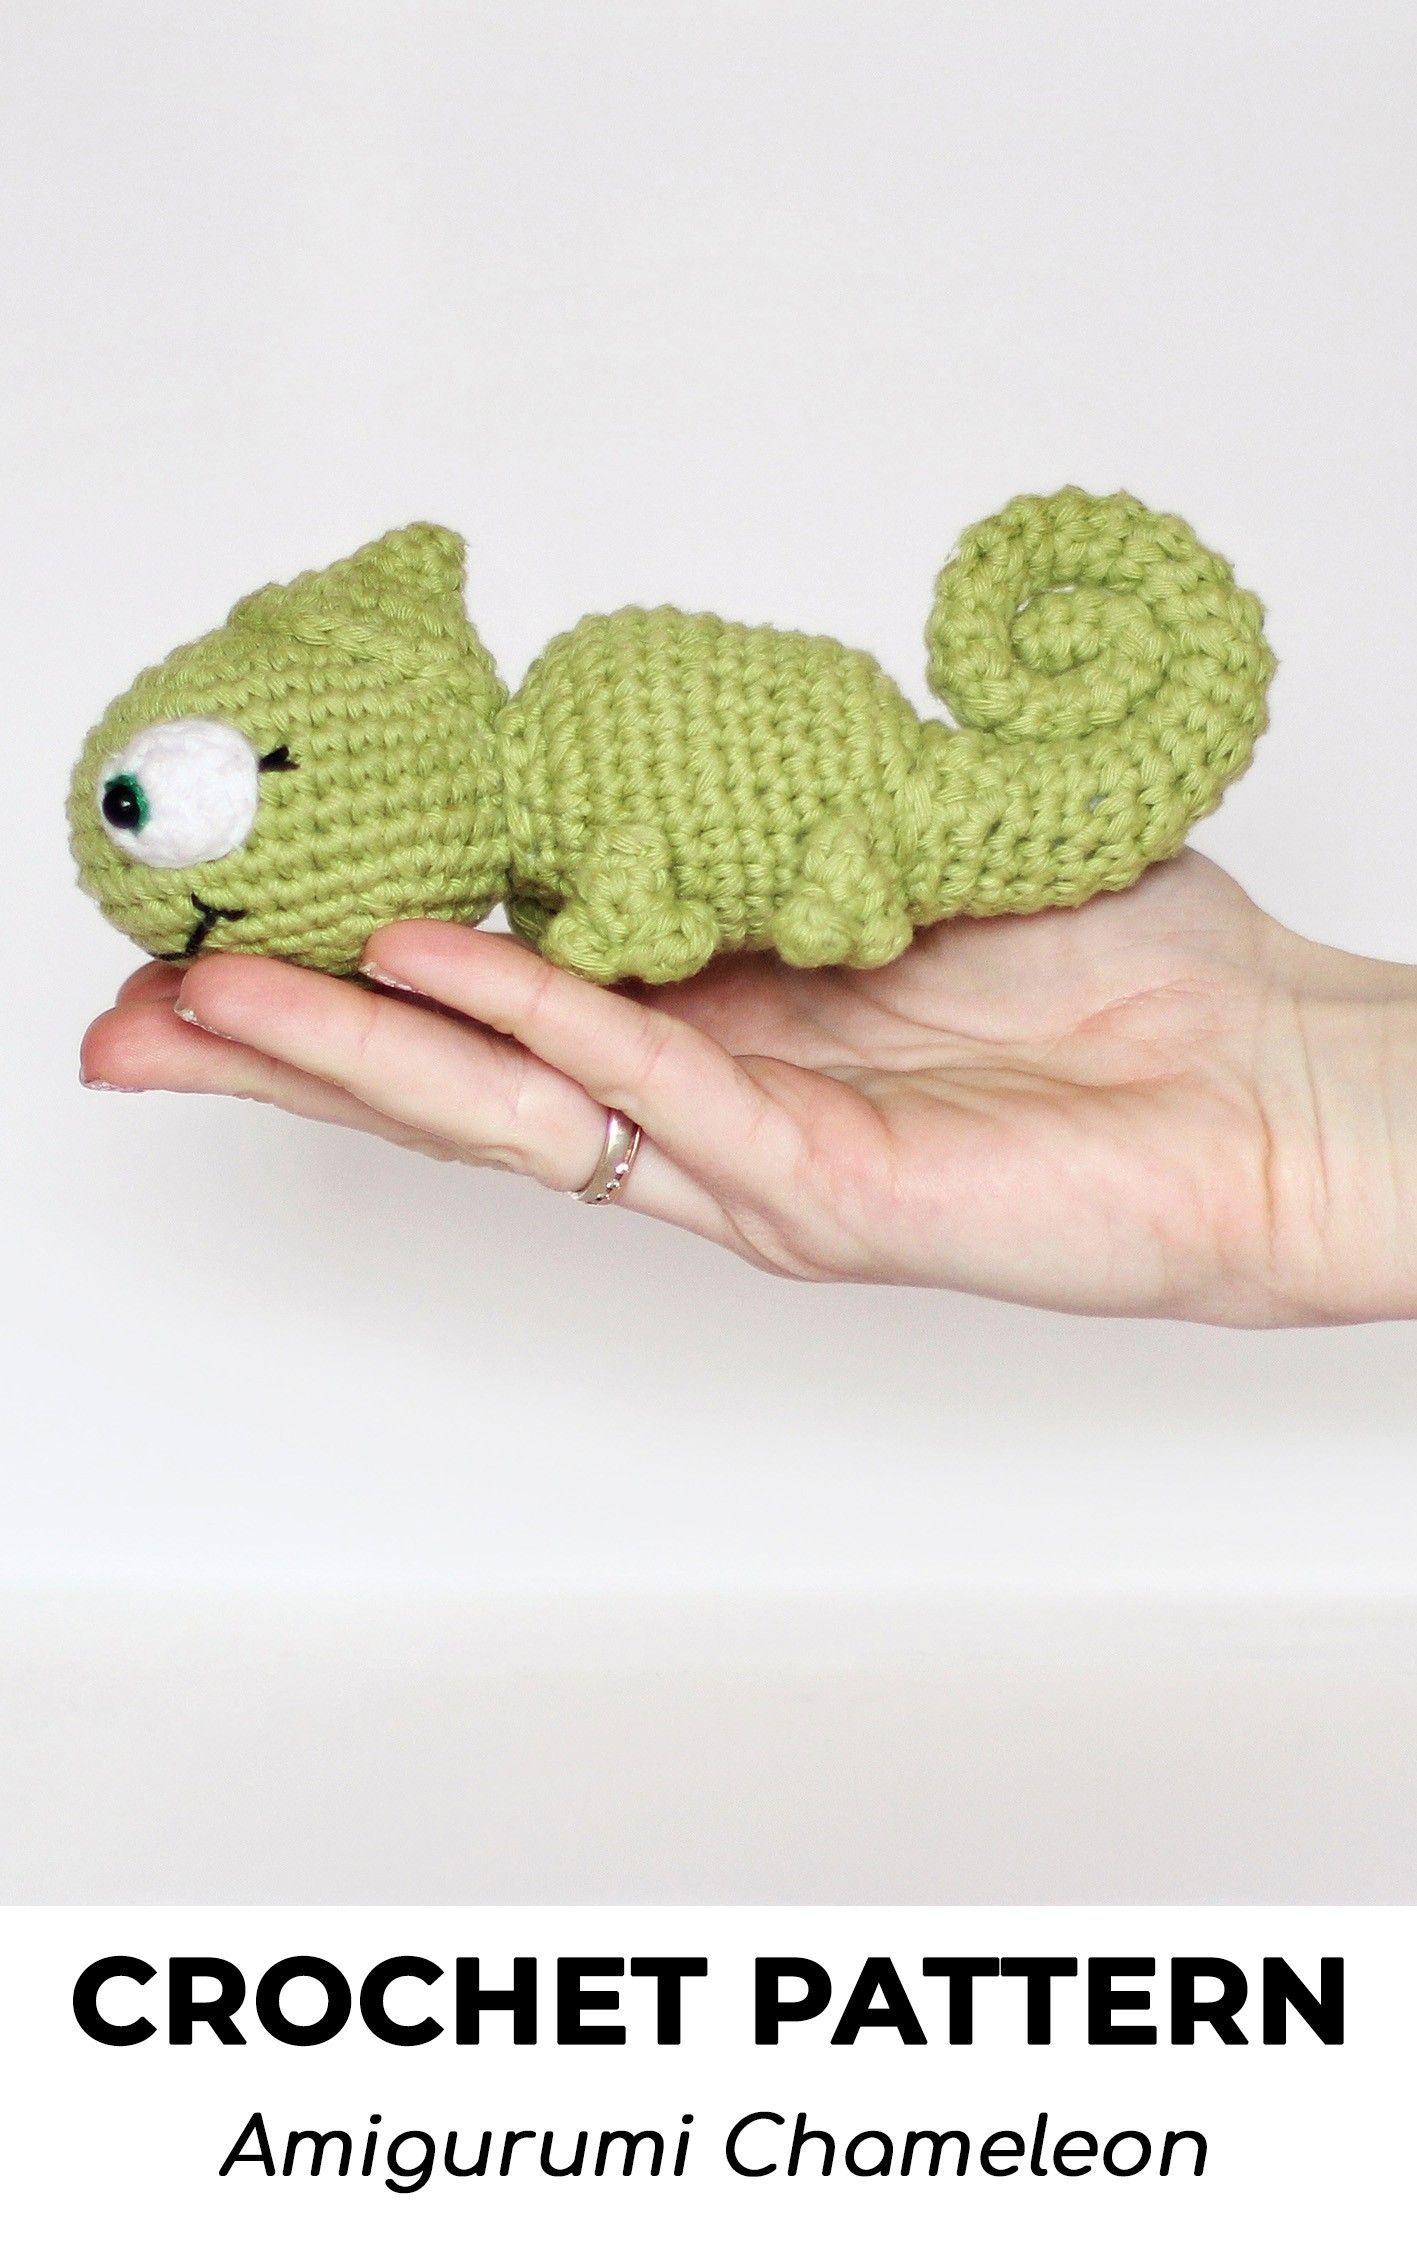 15 Super Cute Crochet Chameleon Amigurumi Patterns - Crochet News | 2268x1417